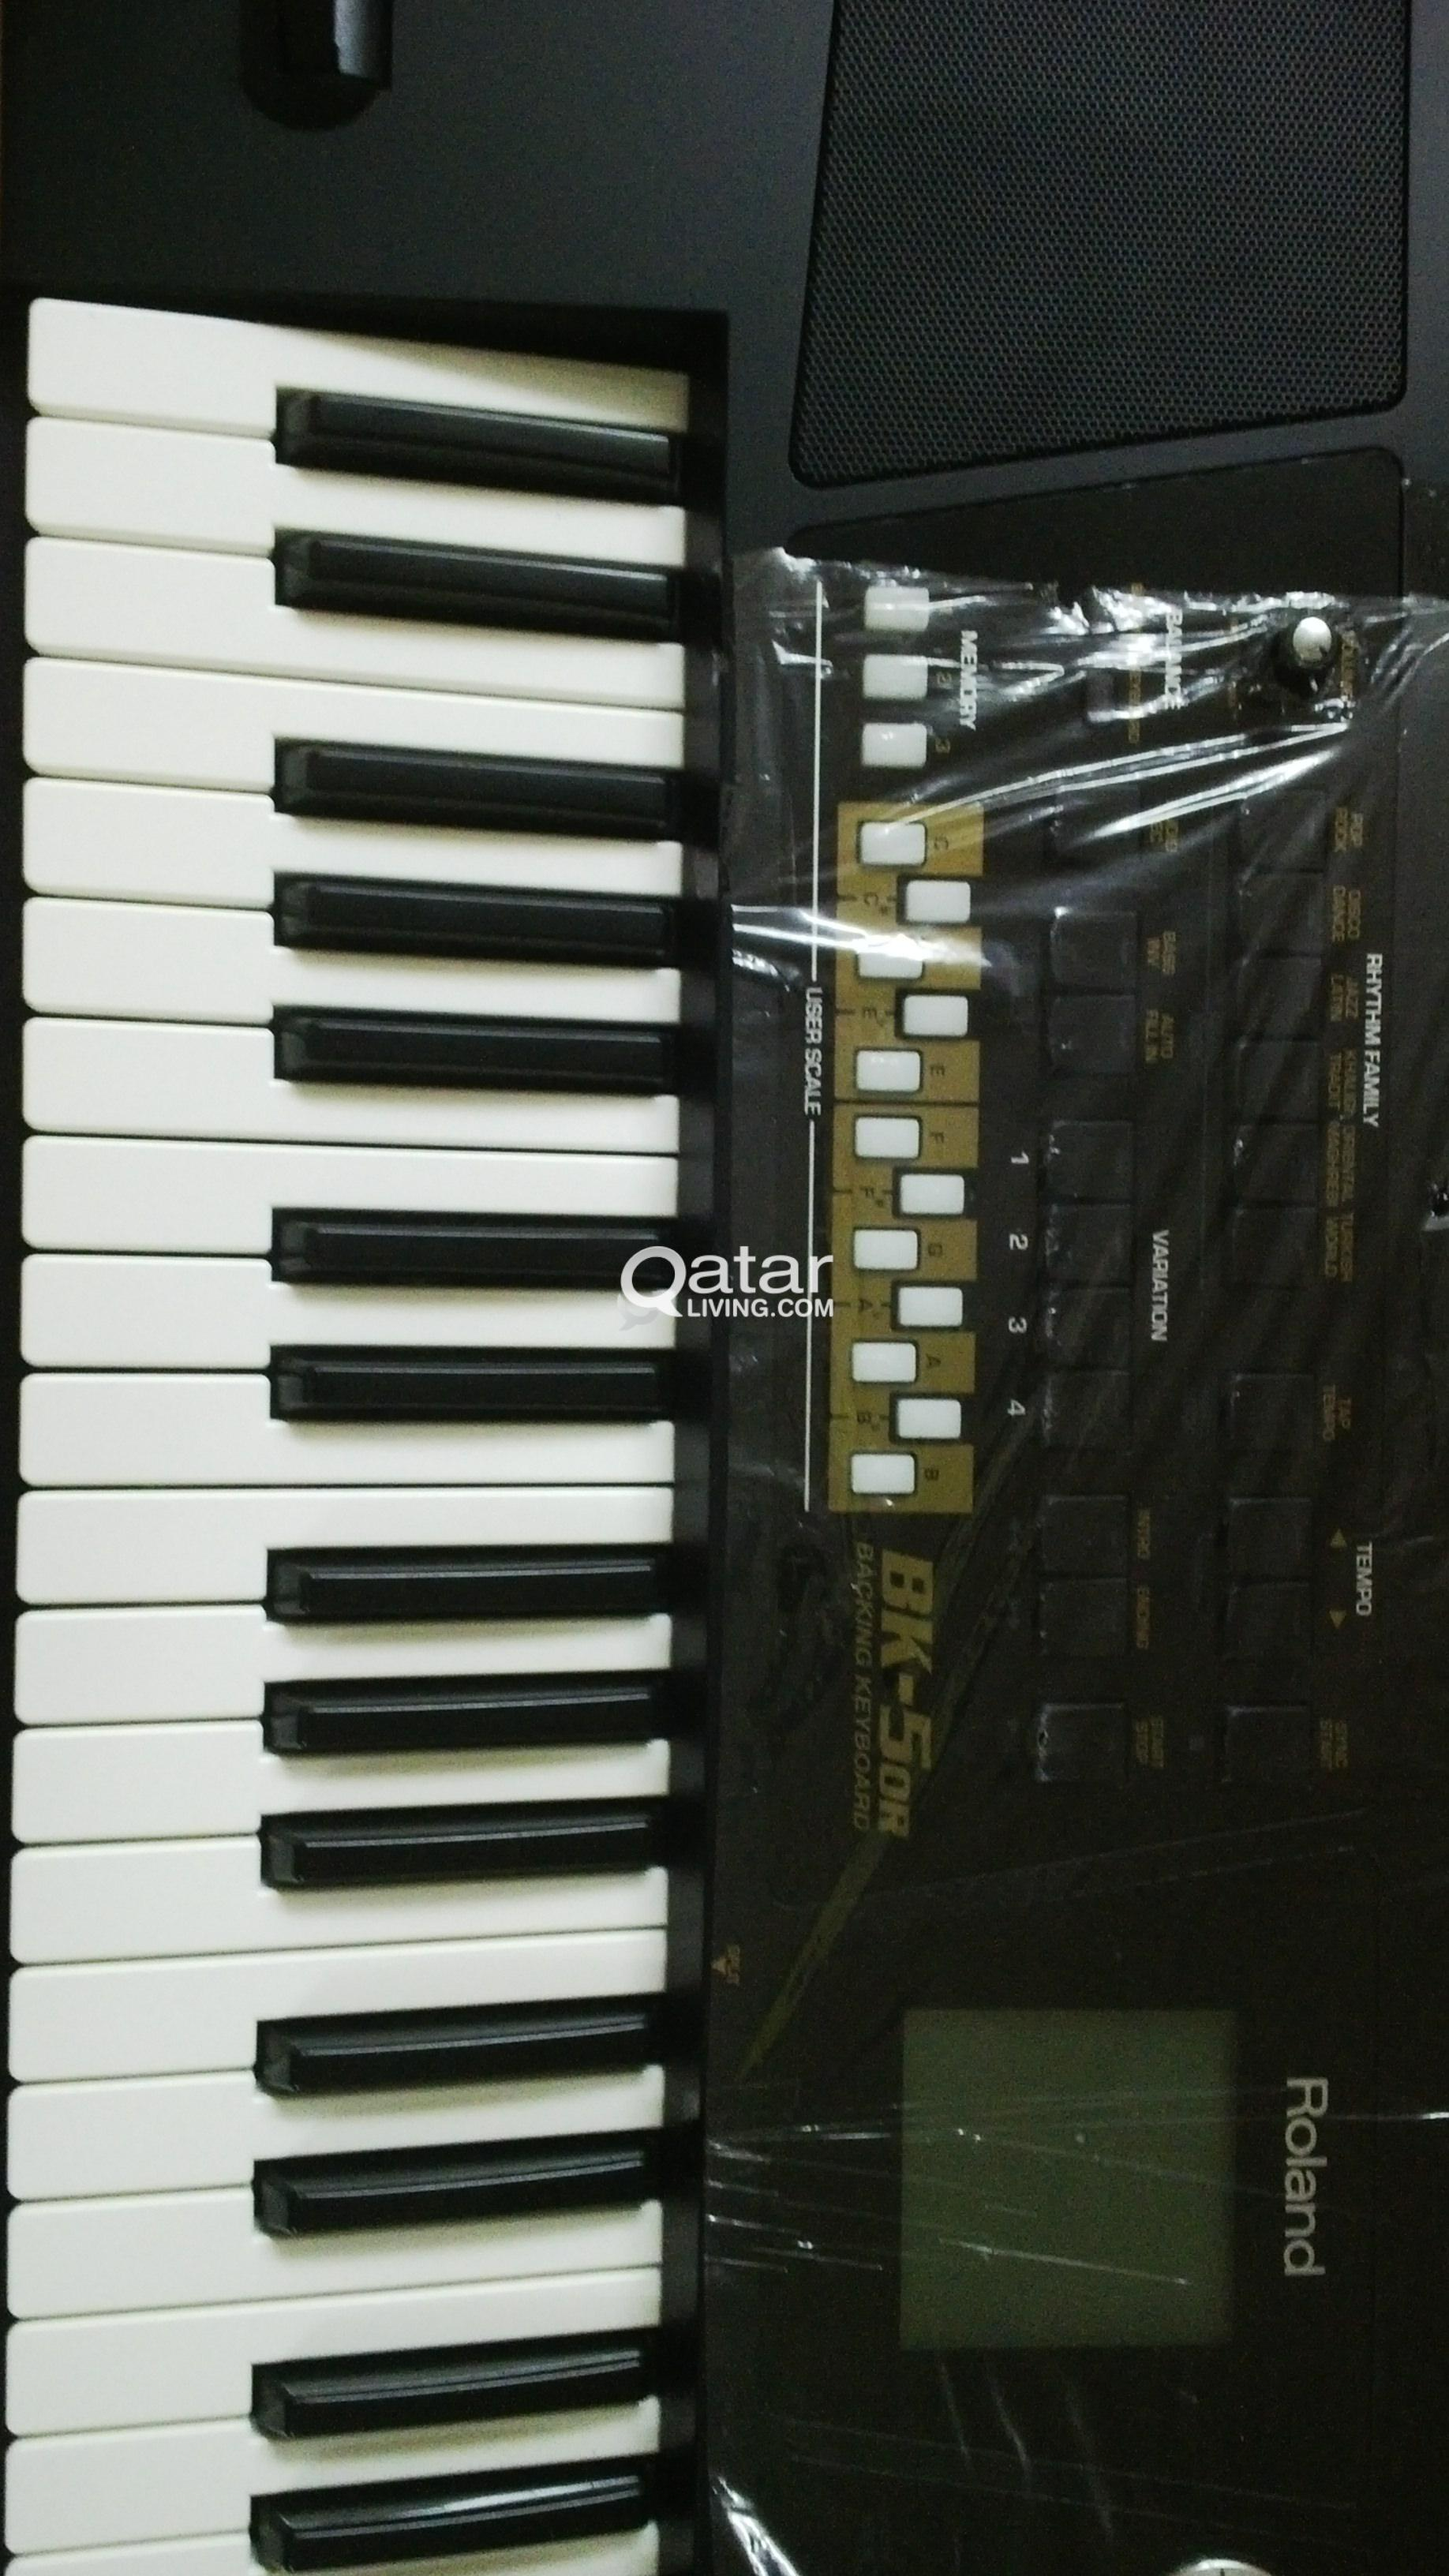 Roland Bk 5  Best Roland Bk 5 With Roland Bk 5  Best Roland Bk 5